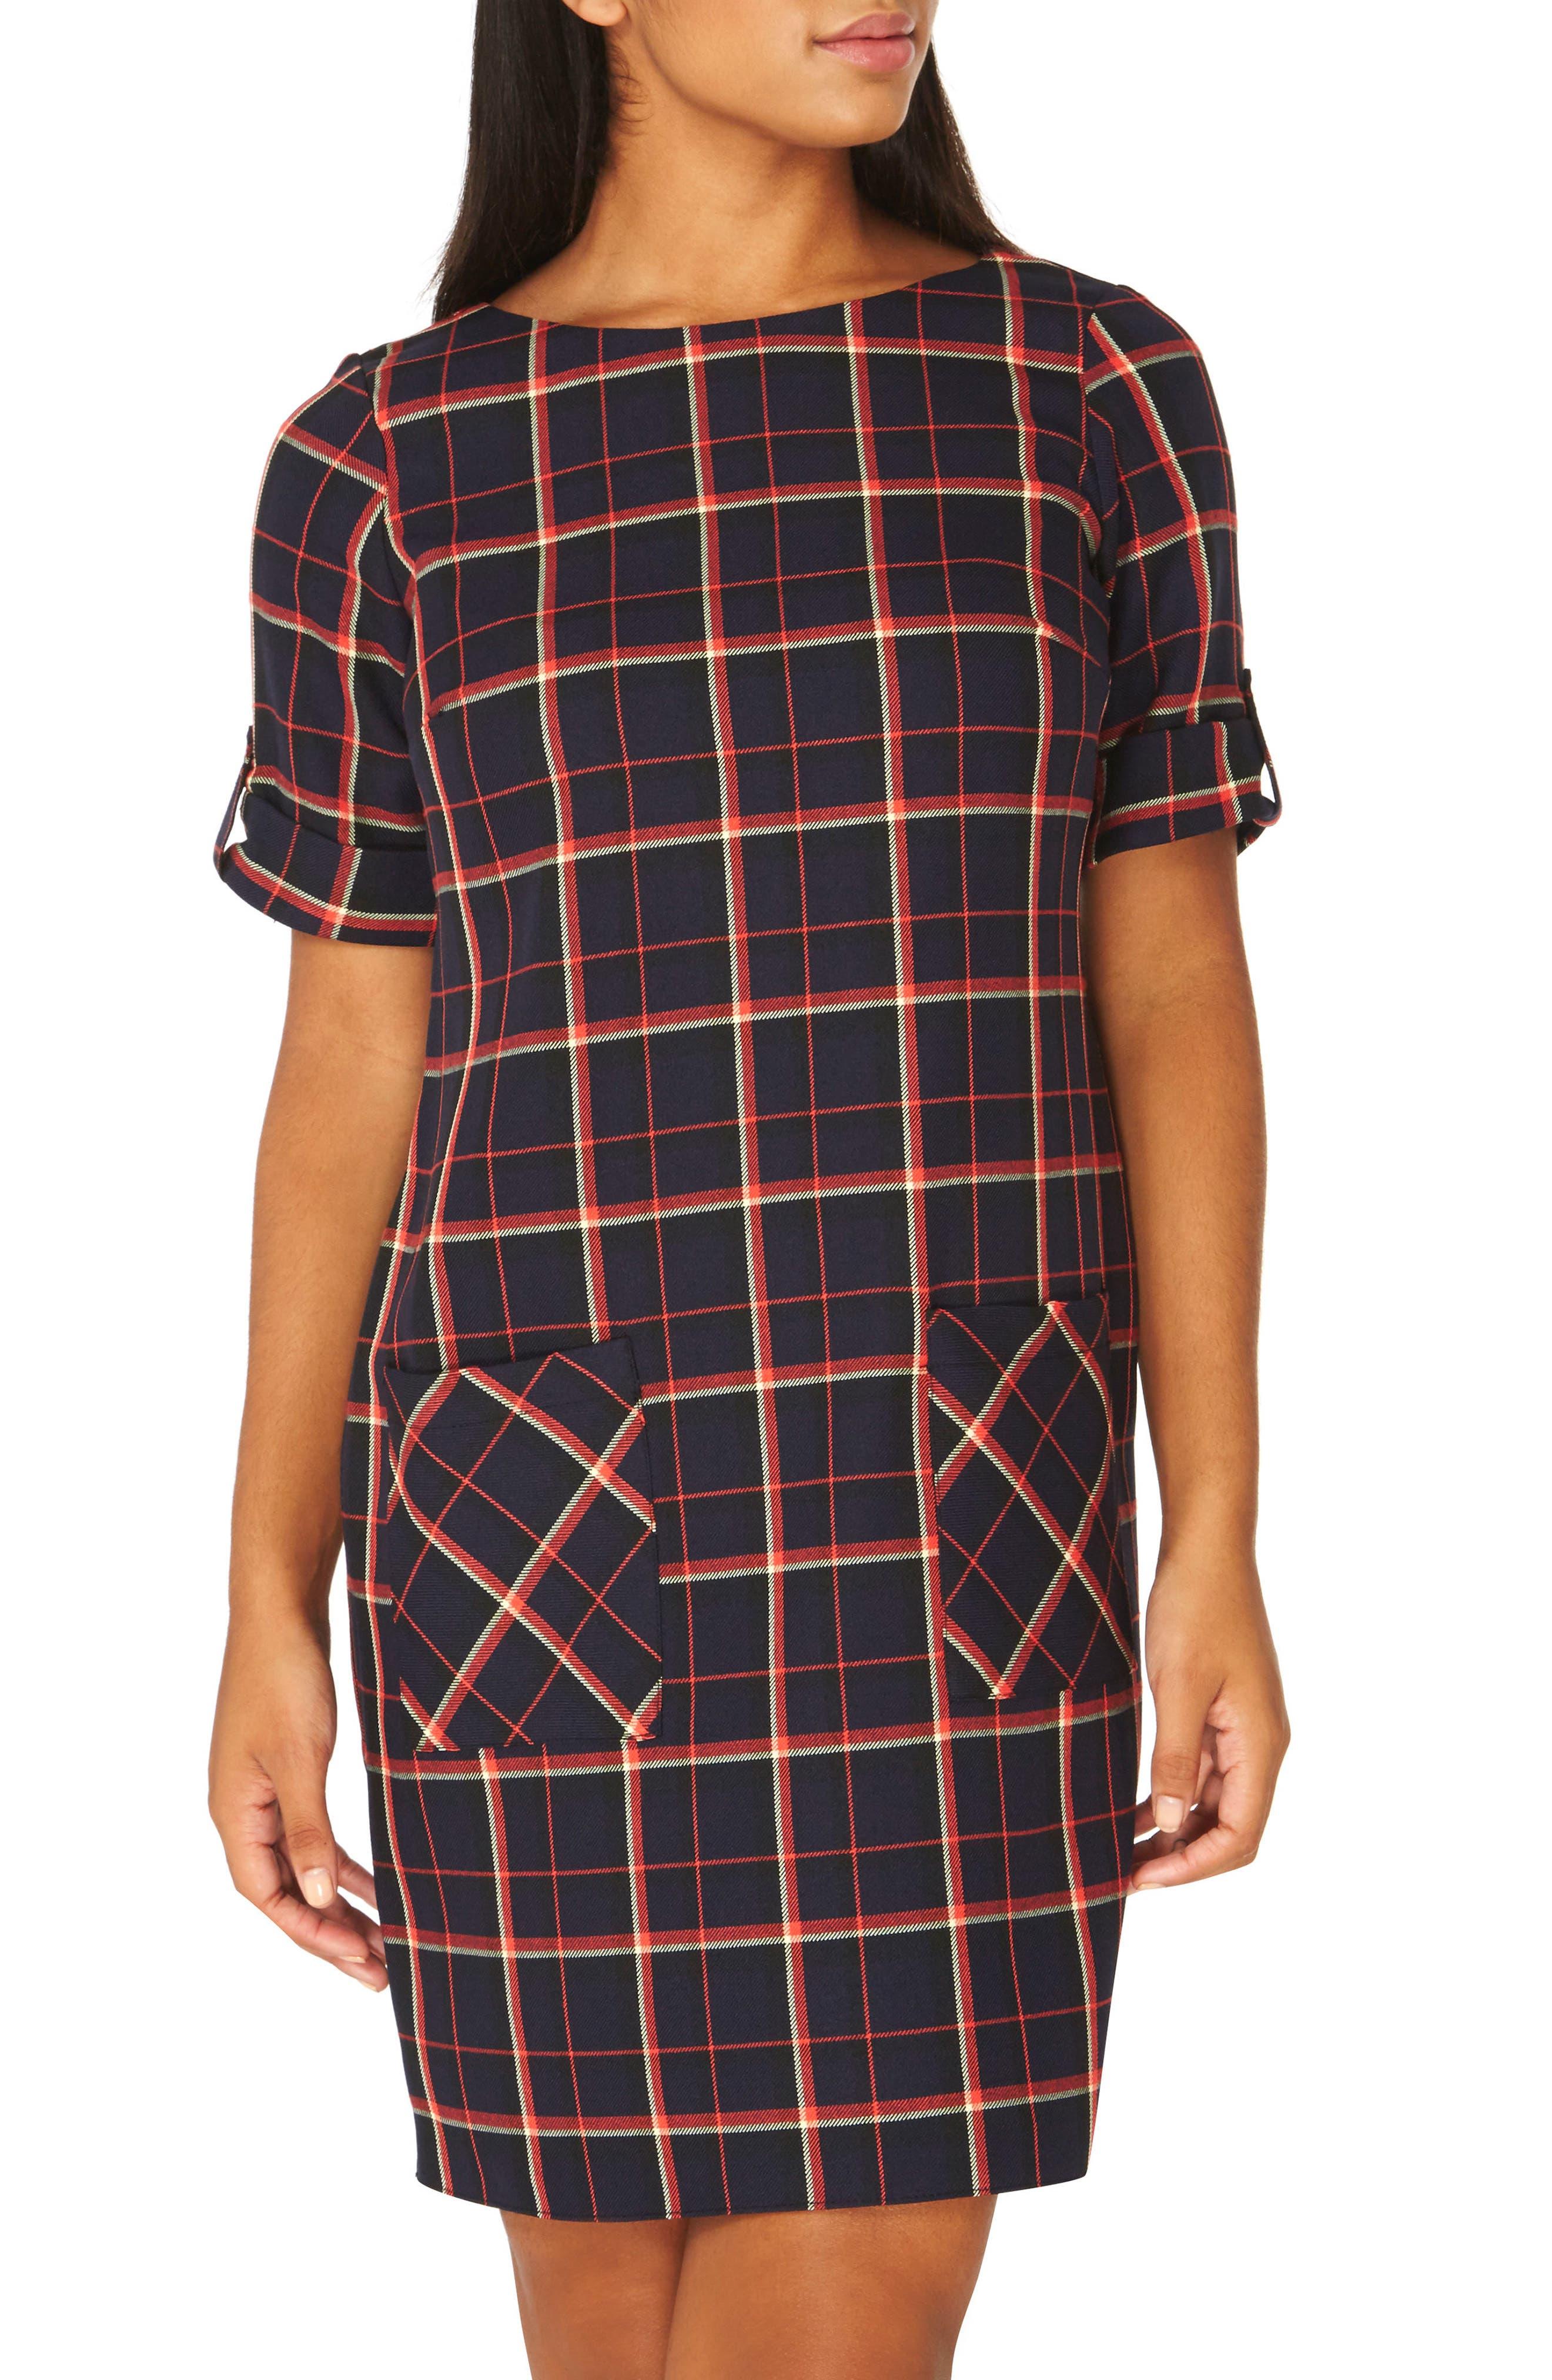 Alternate Image 1 Selected - Dorothy Perkins Check Shift Dress